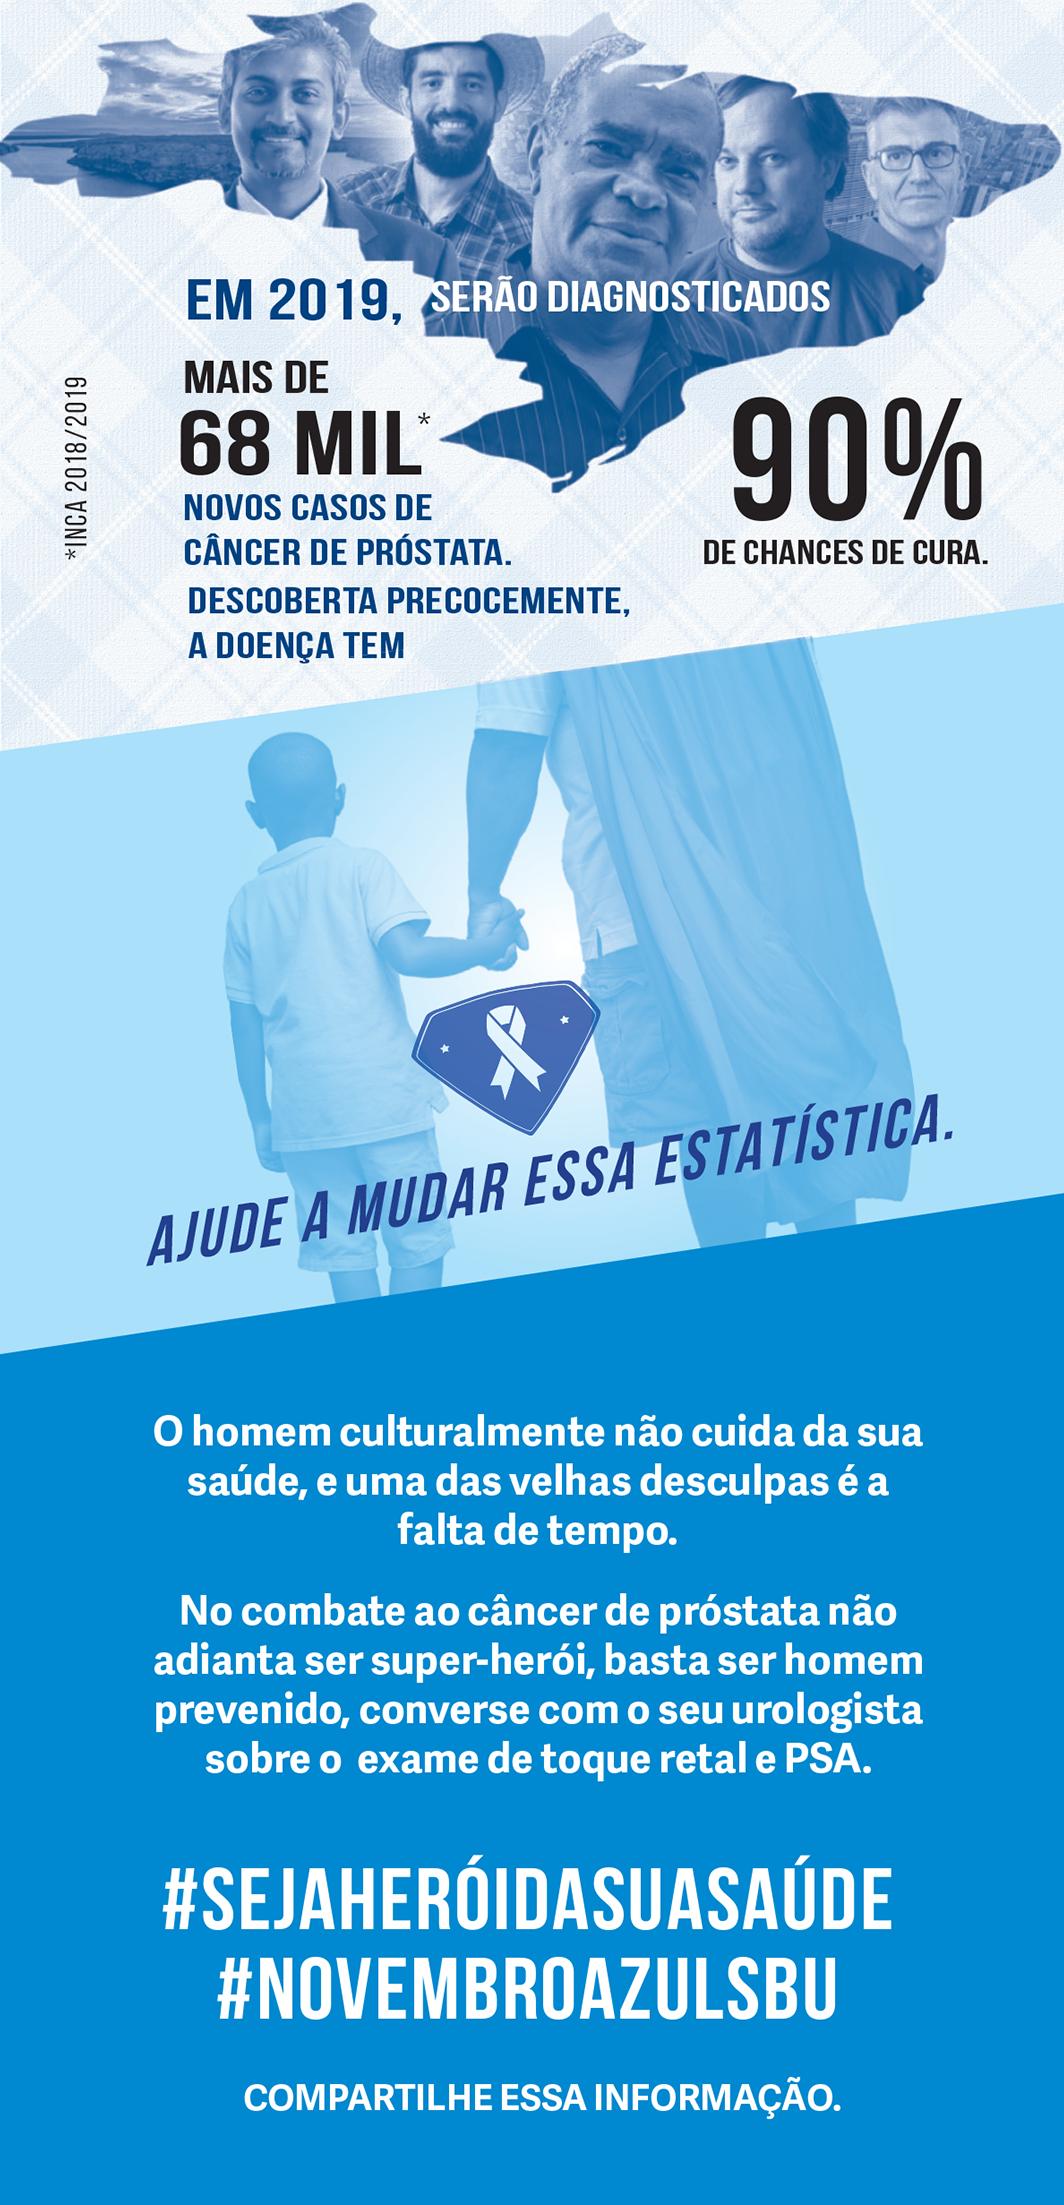 Material da campanha do Novembro Azul da SBU